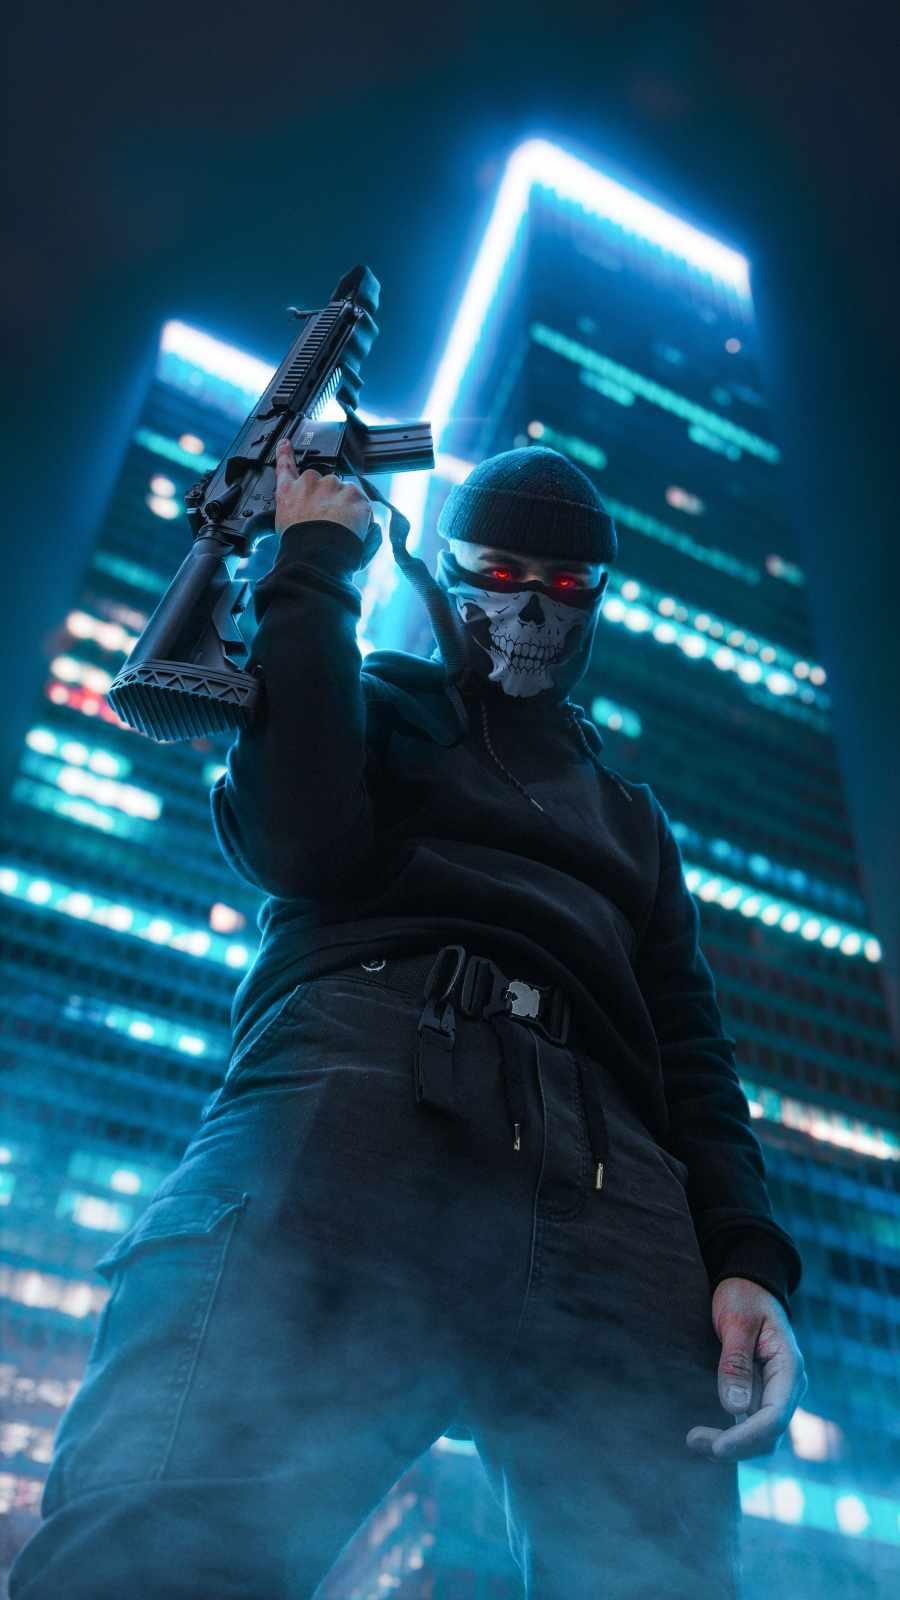 Masked Guy with Gun